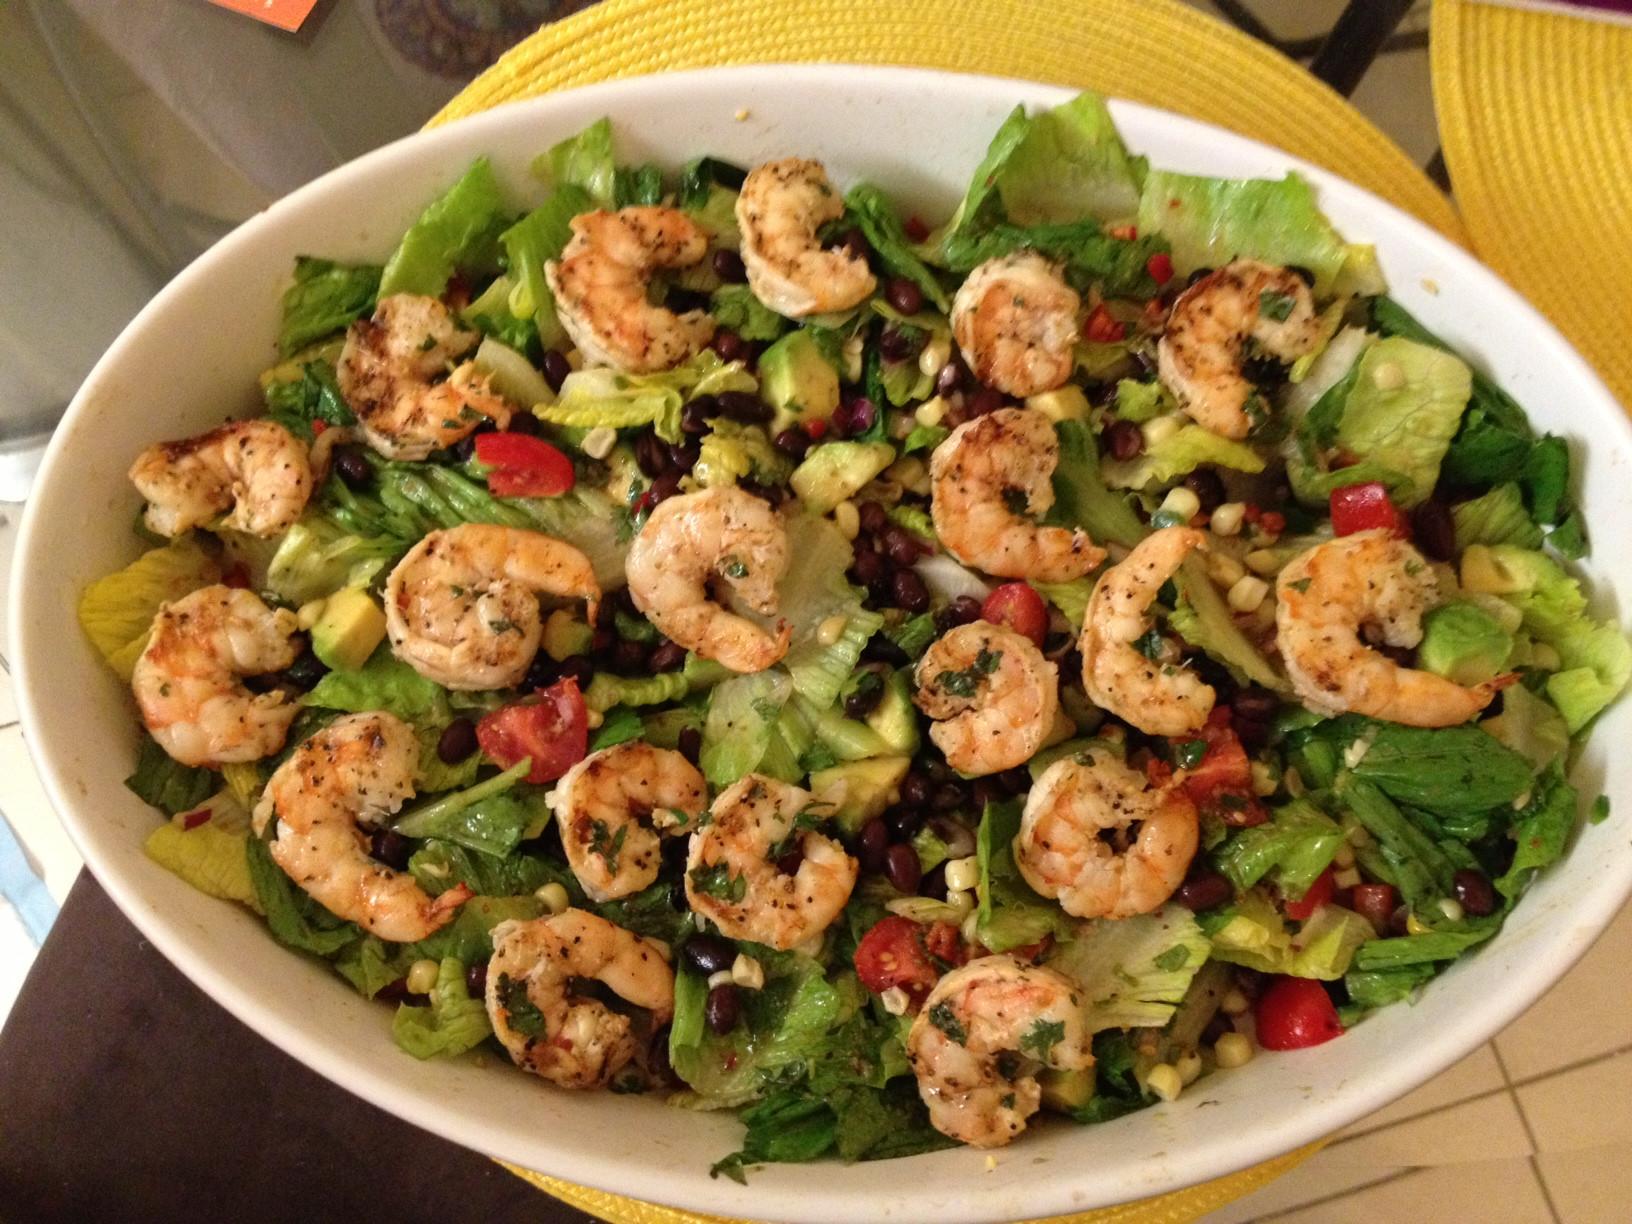 Shrimp Salad Dressings  Grilled Shrimp Corn & Avocado Salad with Cilantro